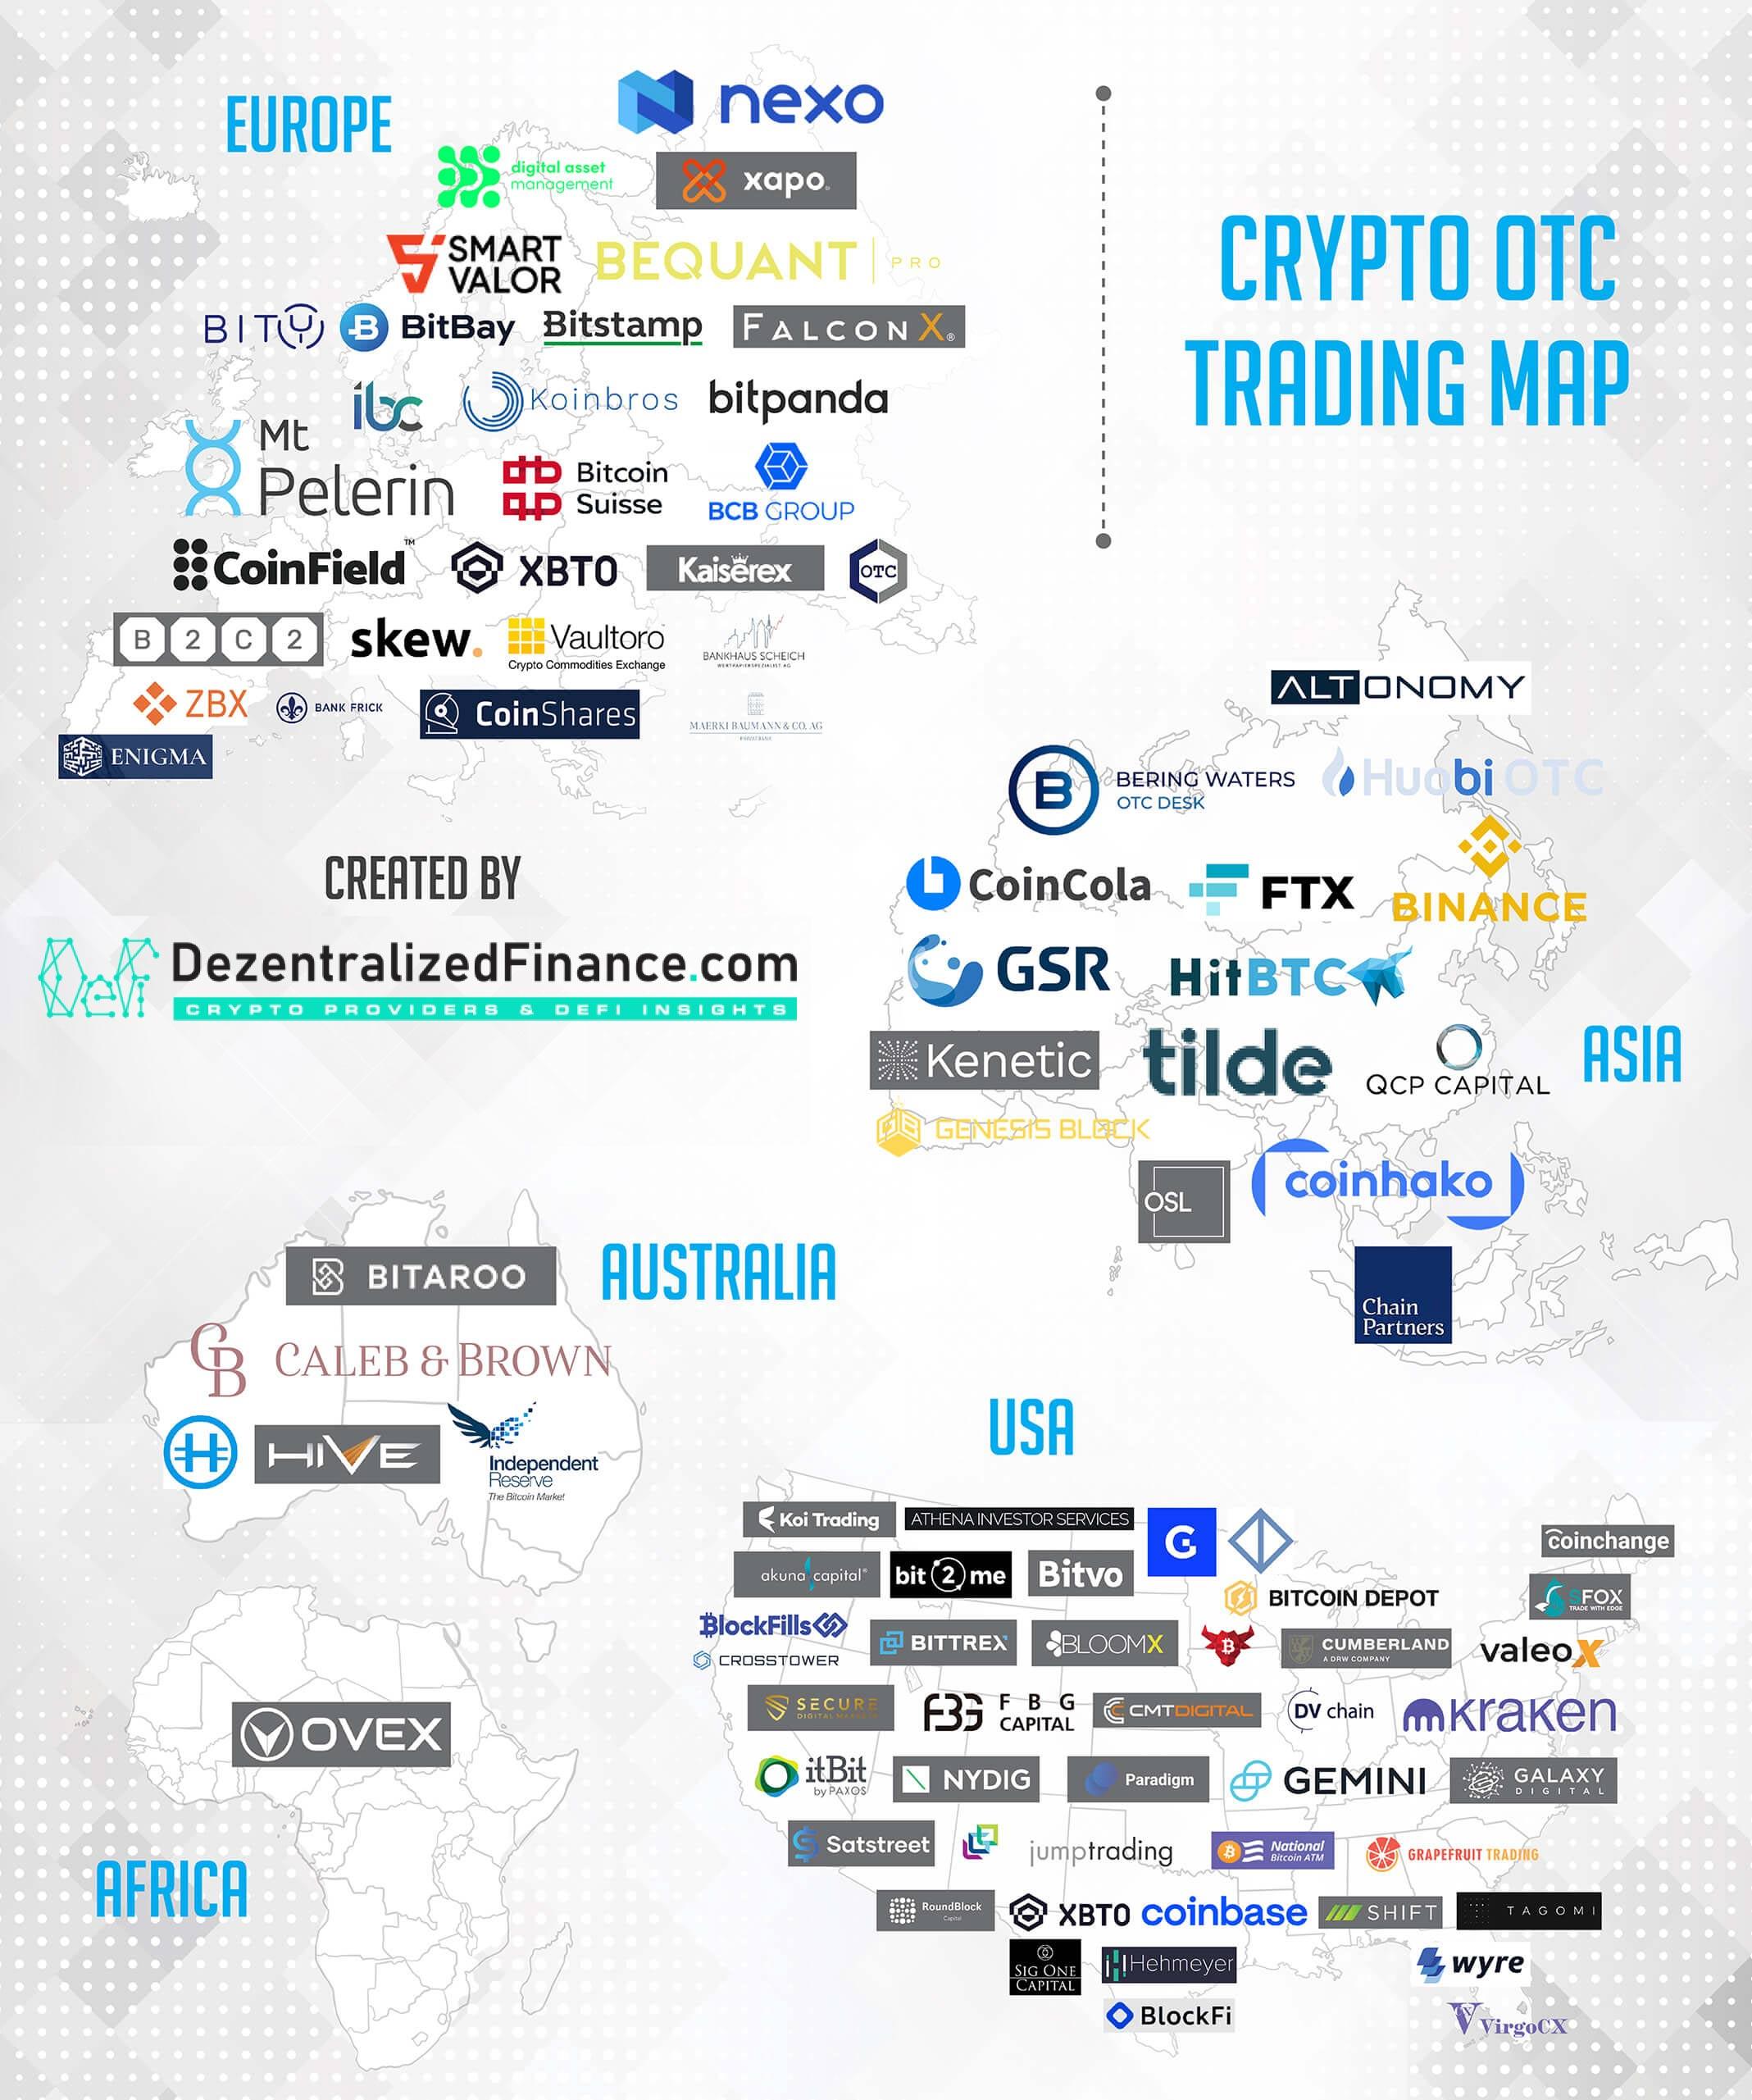 DezentralizedFinance.com OTC Trading Desks Map